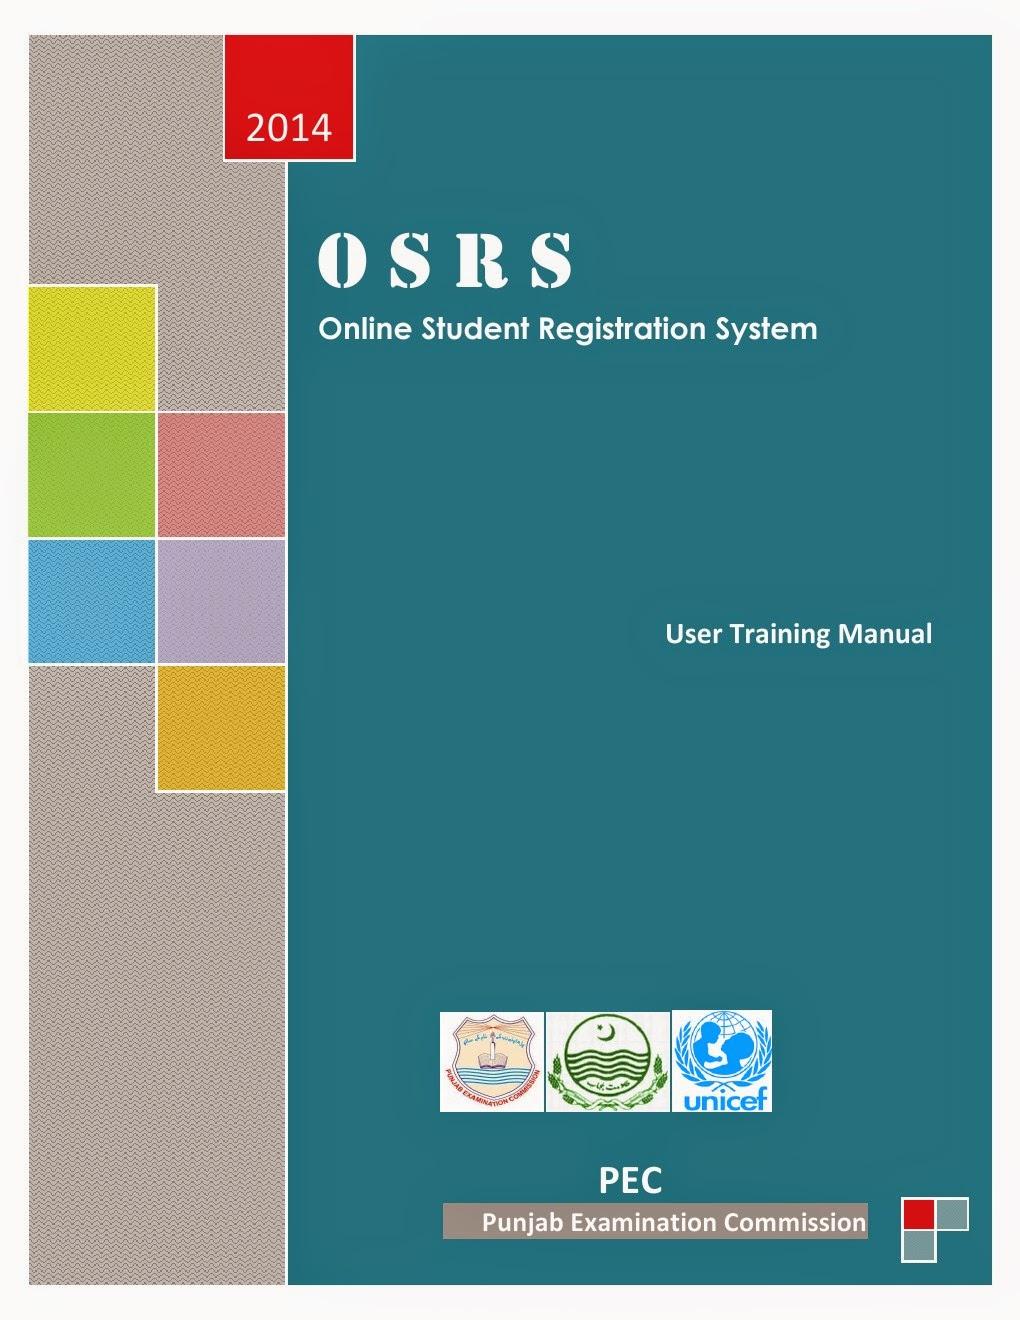 ONLINE STUDENT REGISTRATION SYSTEM, USER TRAINING MANUAL